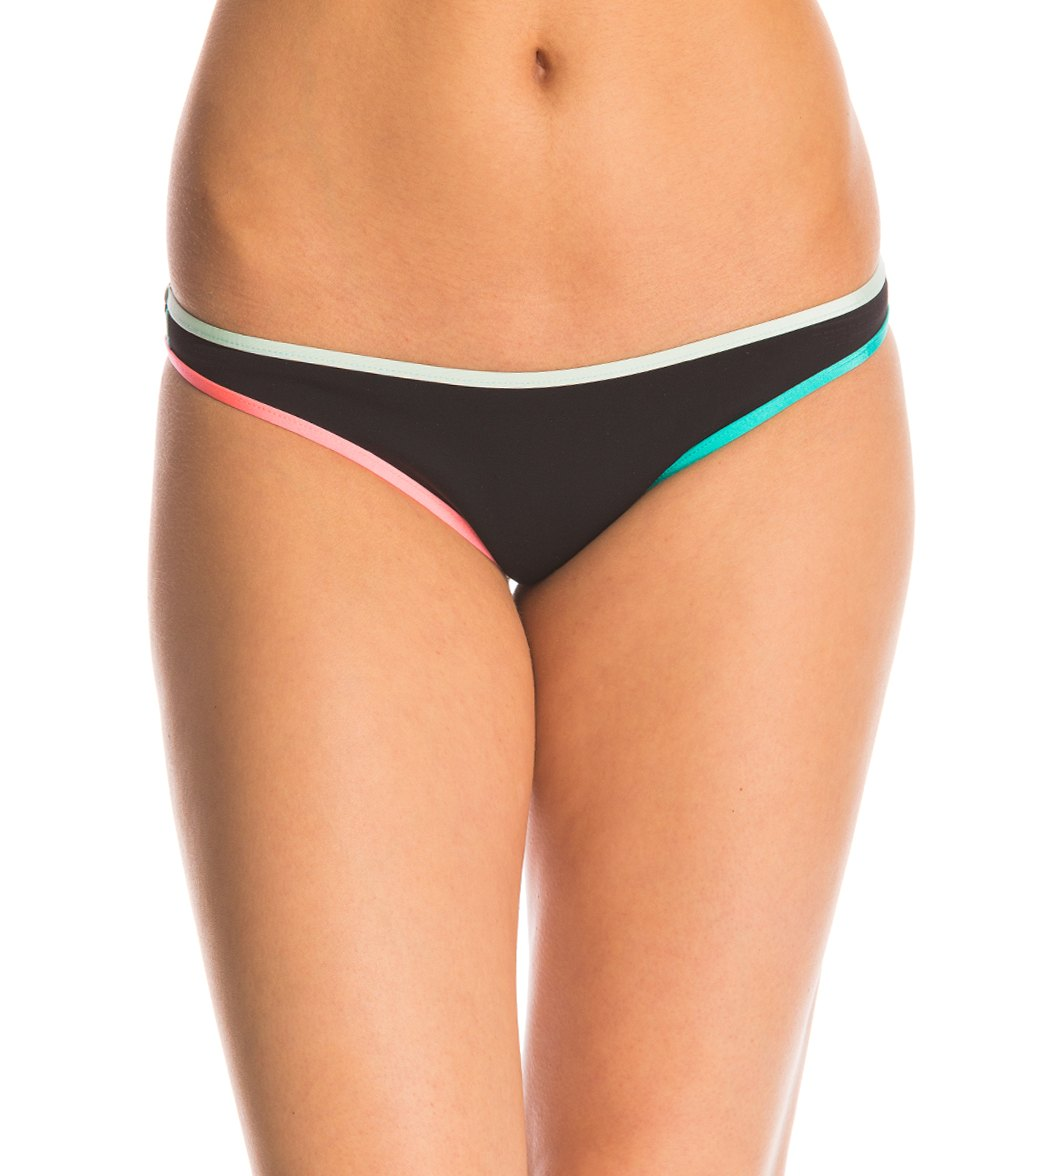 6e0ab4b0373 ... B.Swim Edgy Noir Nova Cheeky Reversible Bikini Bottom. Play Video.  MODEL MEASUREMENTS